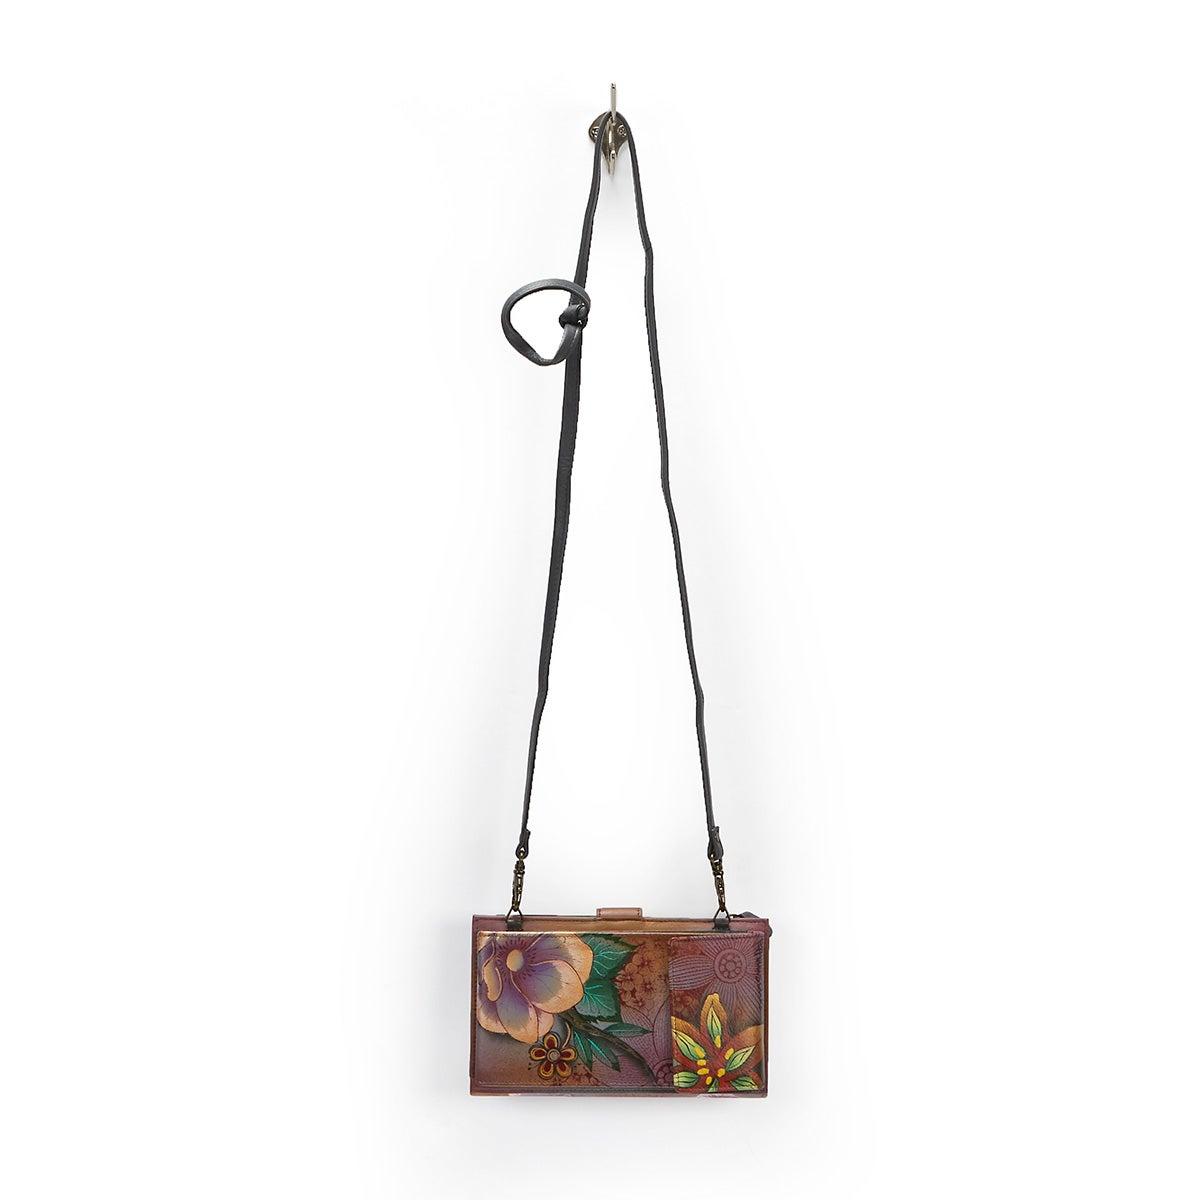 Painted lthr Blissful Bird phncse/wallet